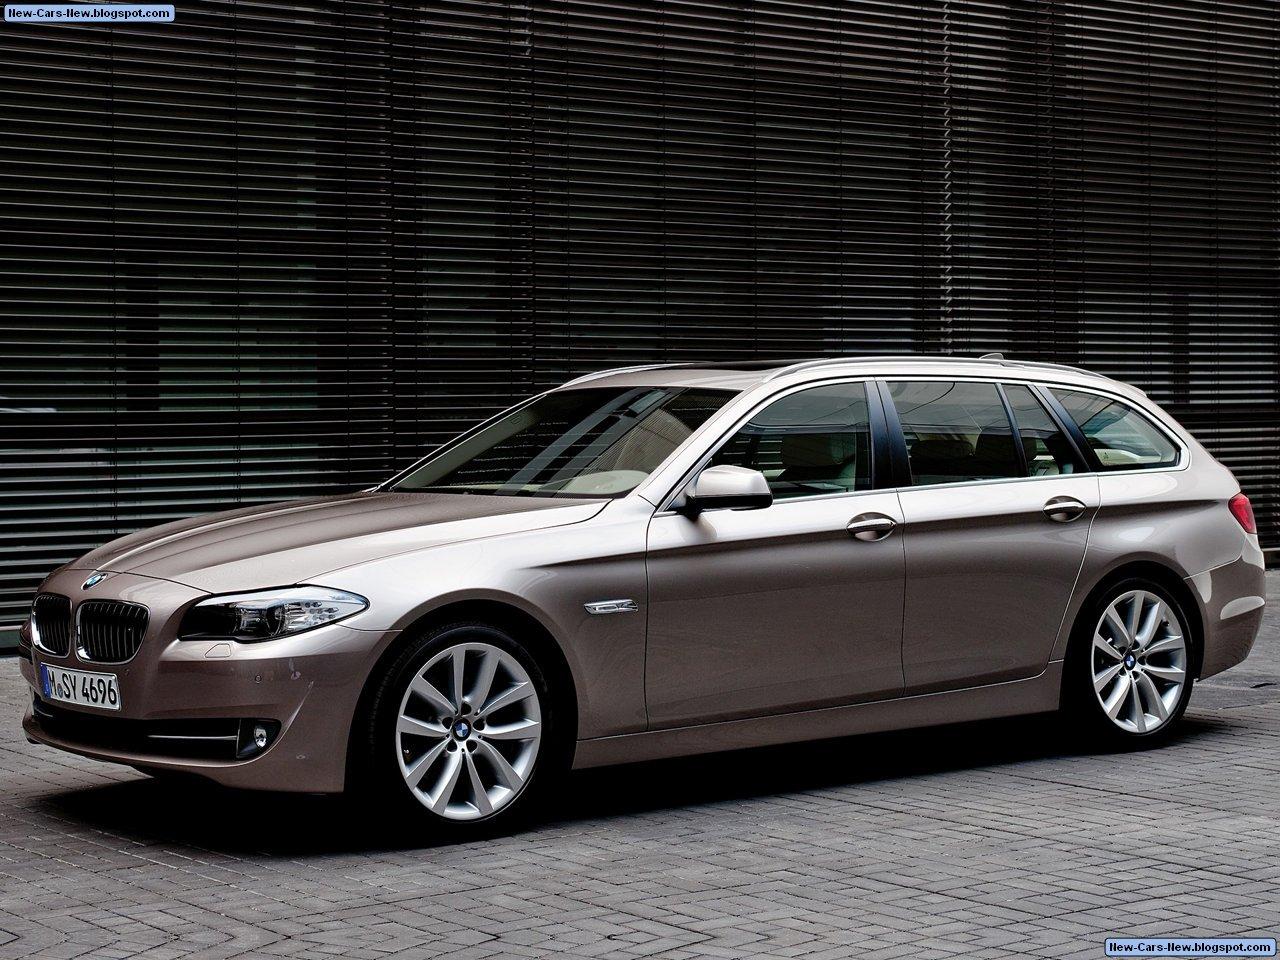 http://2.bp.blogspot.com/_U4w592tUDHM/TCMRGkrG1GI/AAAAAAAADM4/KxAUe_IO3bg/s1600/BMW-5-Series_Touring_2011_1280x960_wallpaper_01.jpg